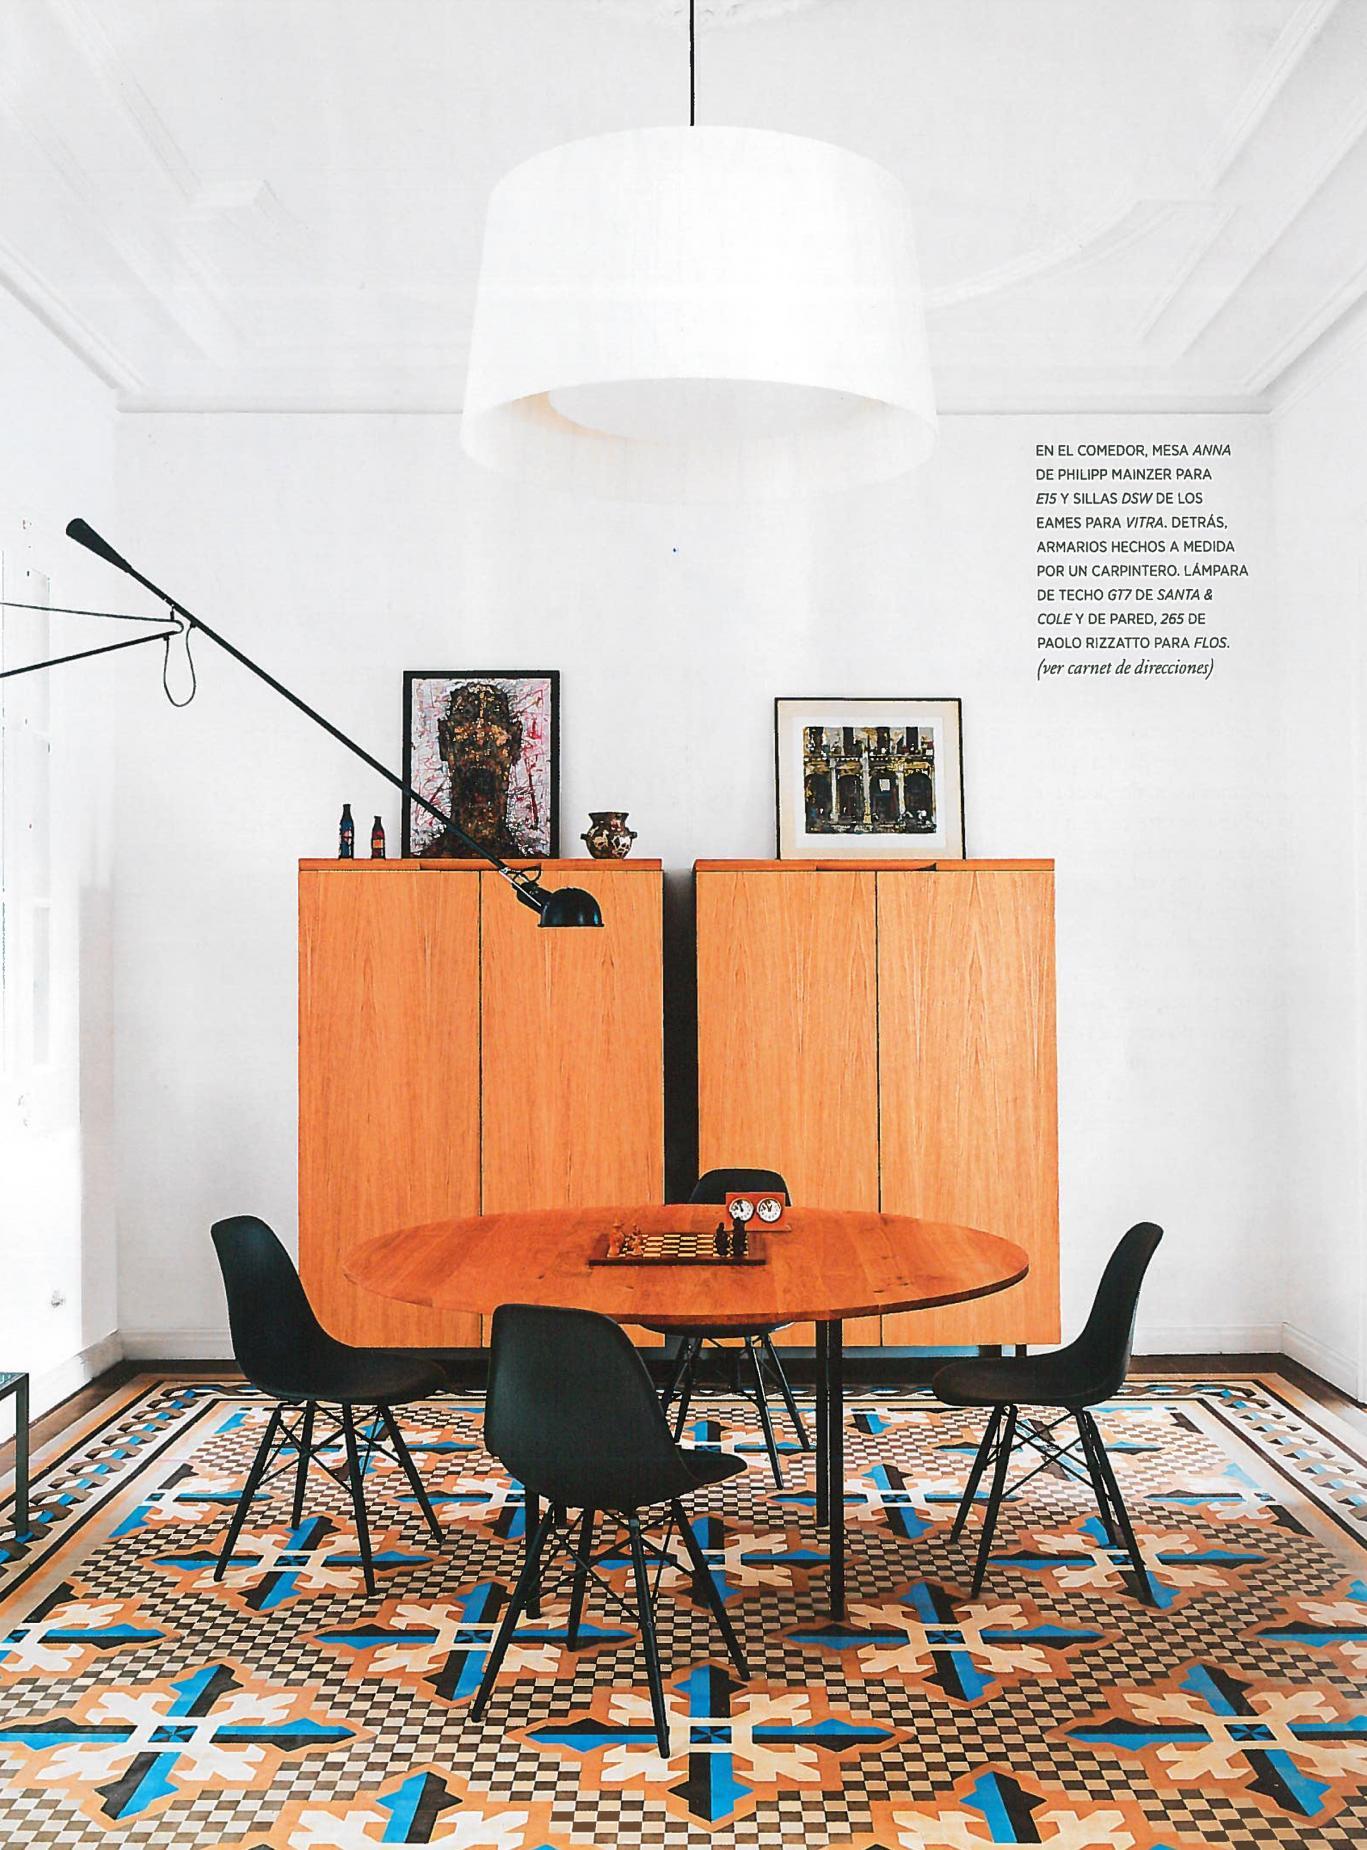 studio vilablach in AD project modernist floor barcelona